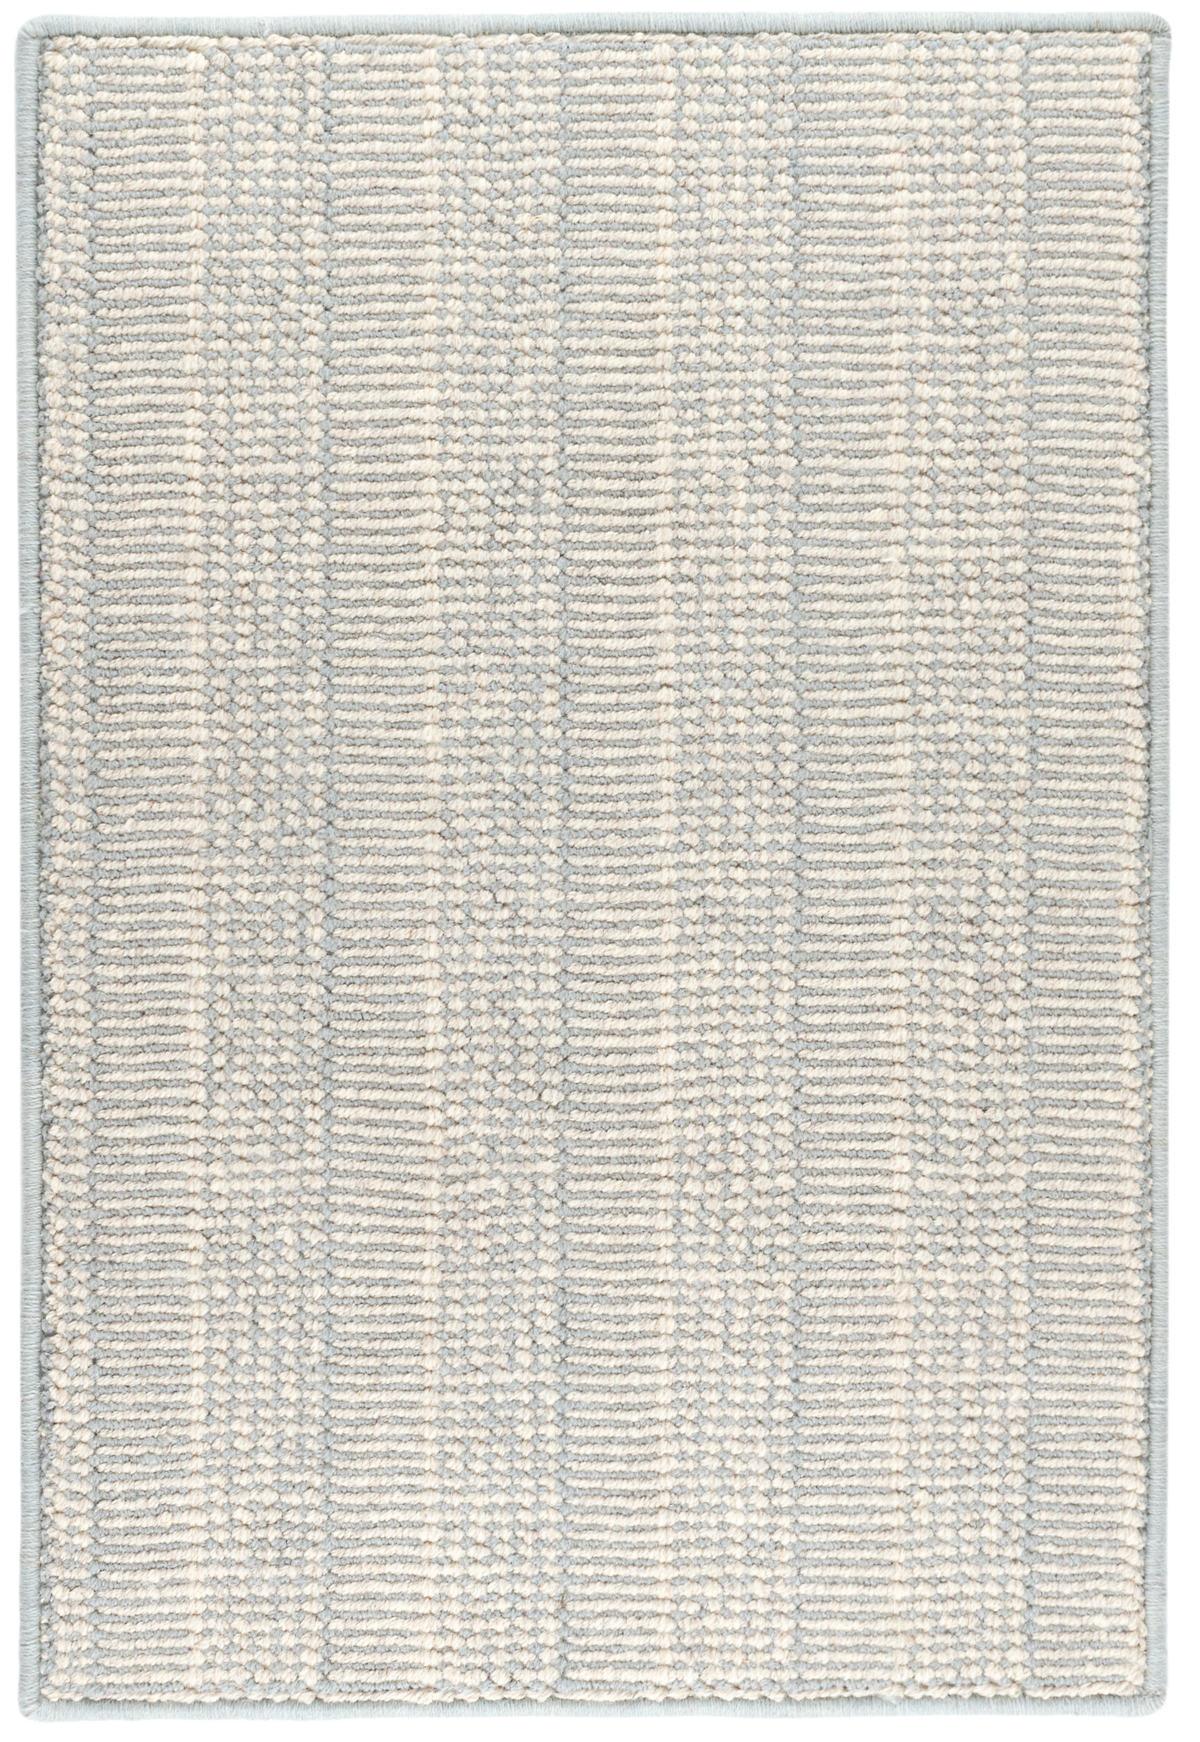 Raffa Slate Woven Wool Rug